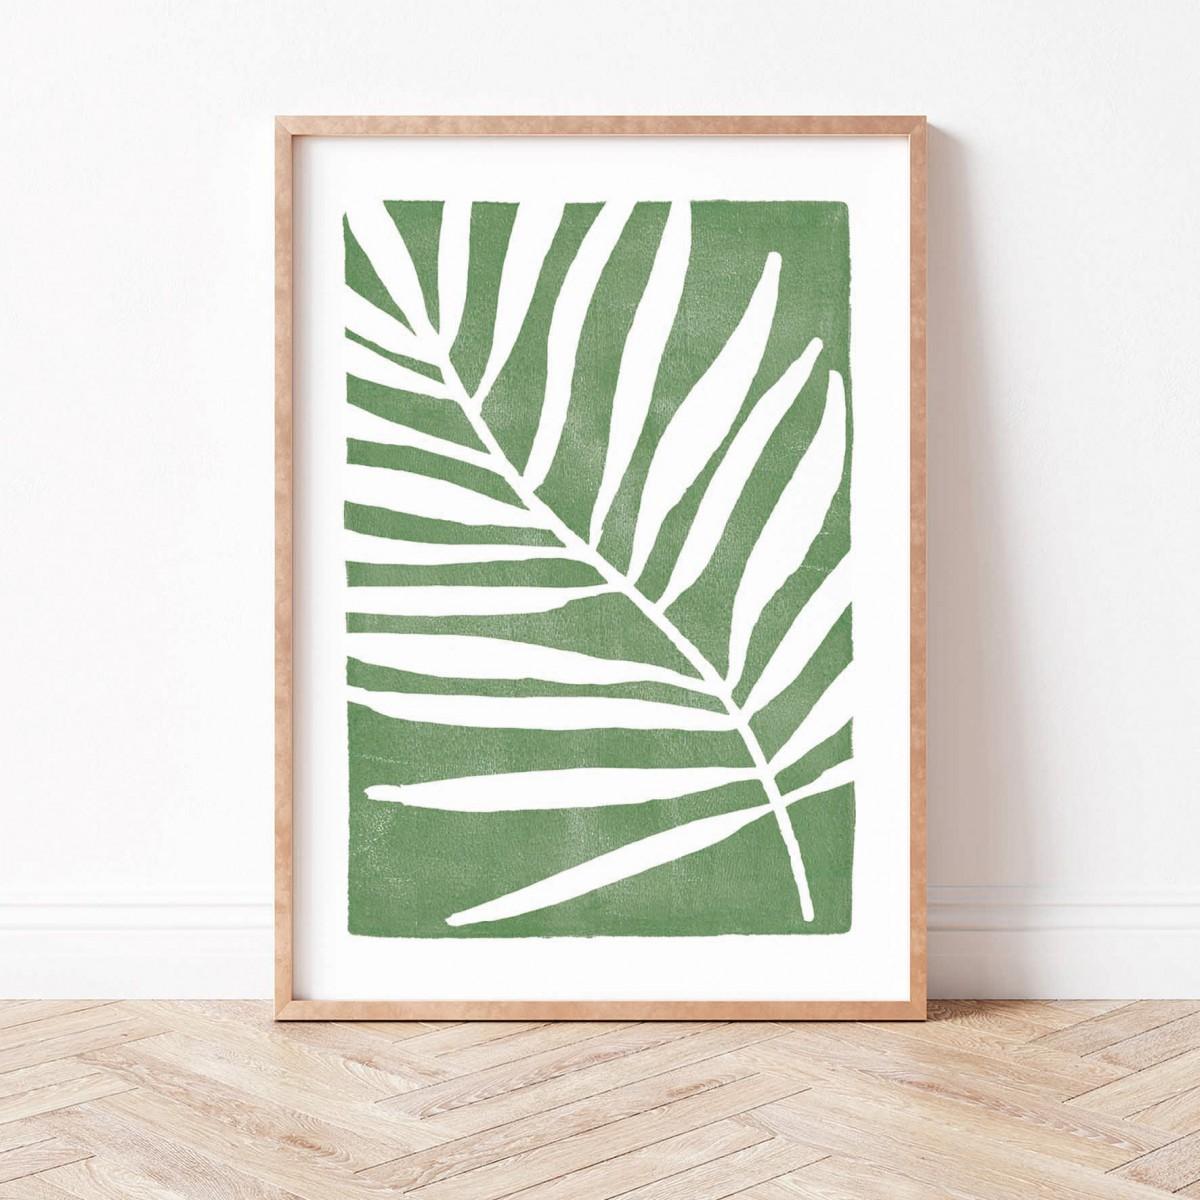 Paperlandscape | Kunstdruck | Palmblatt grün | abstrakt | Blatt | Pflanzen | verschiedene Größen